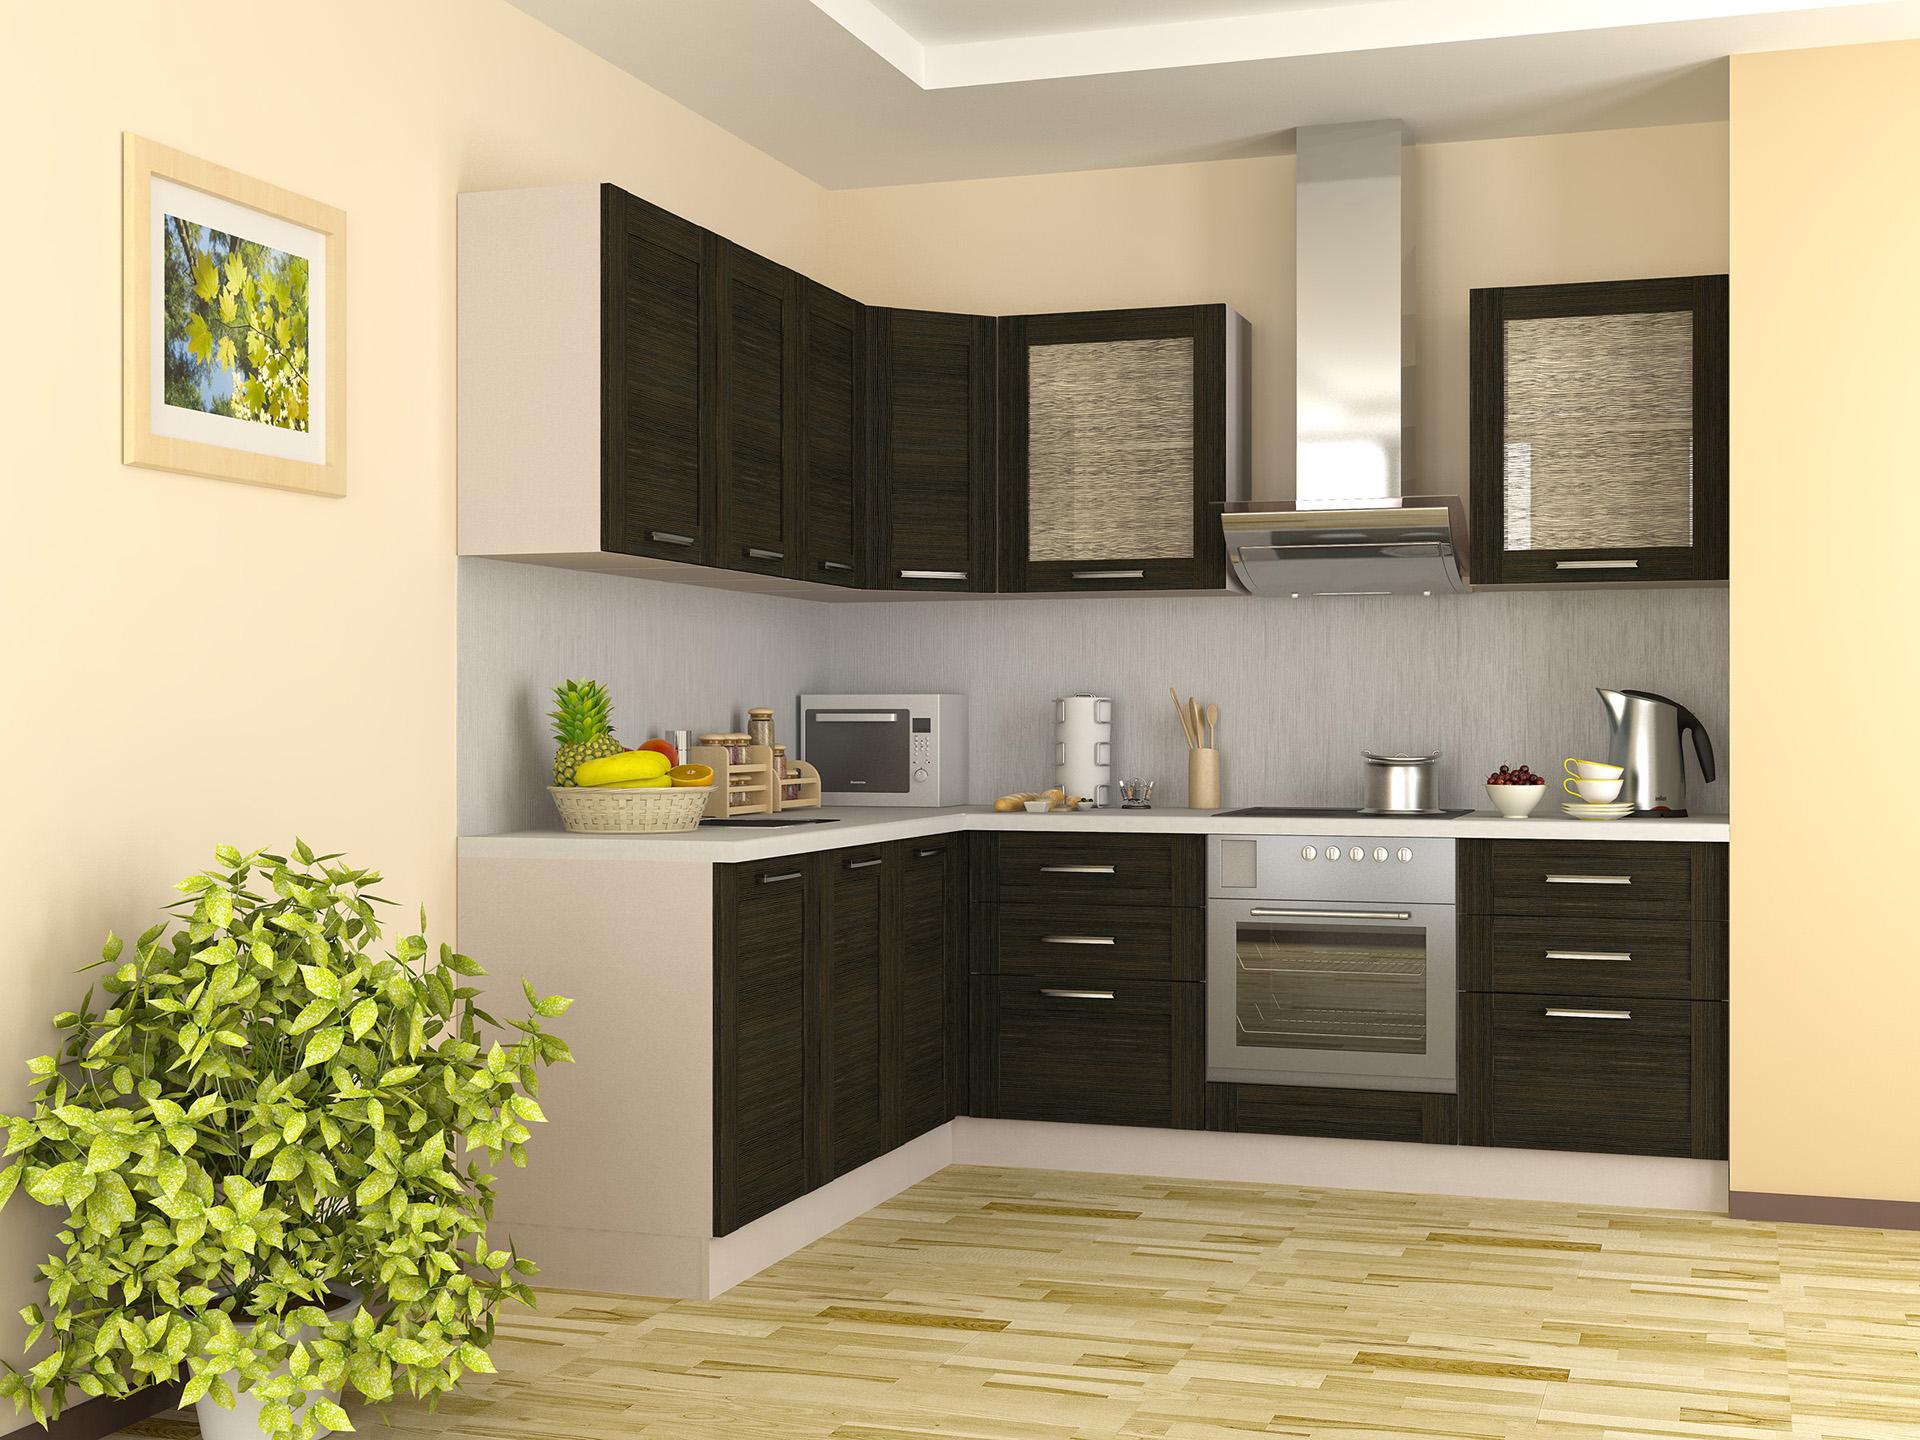 Модерновая кухня с рамочным фасадом